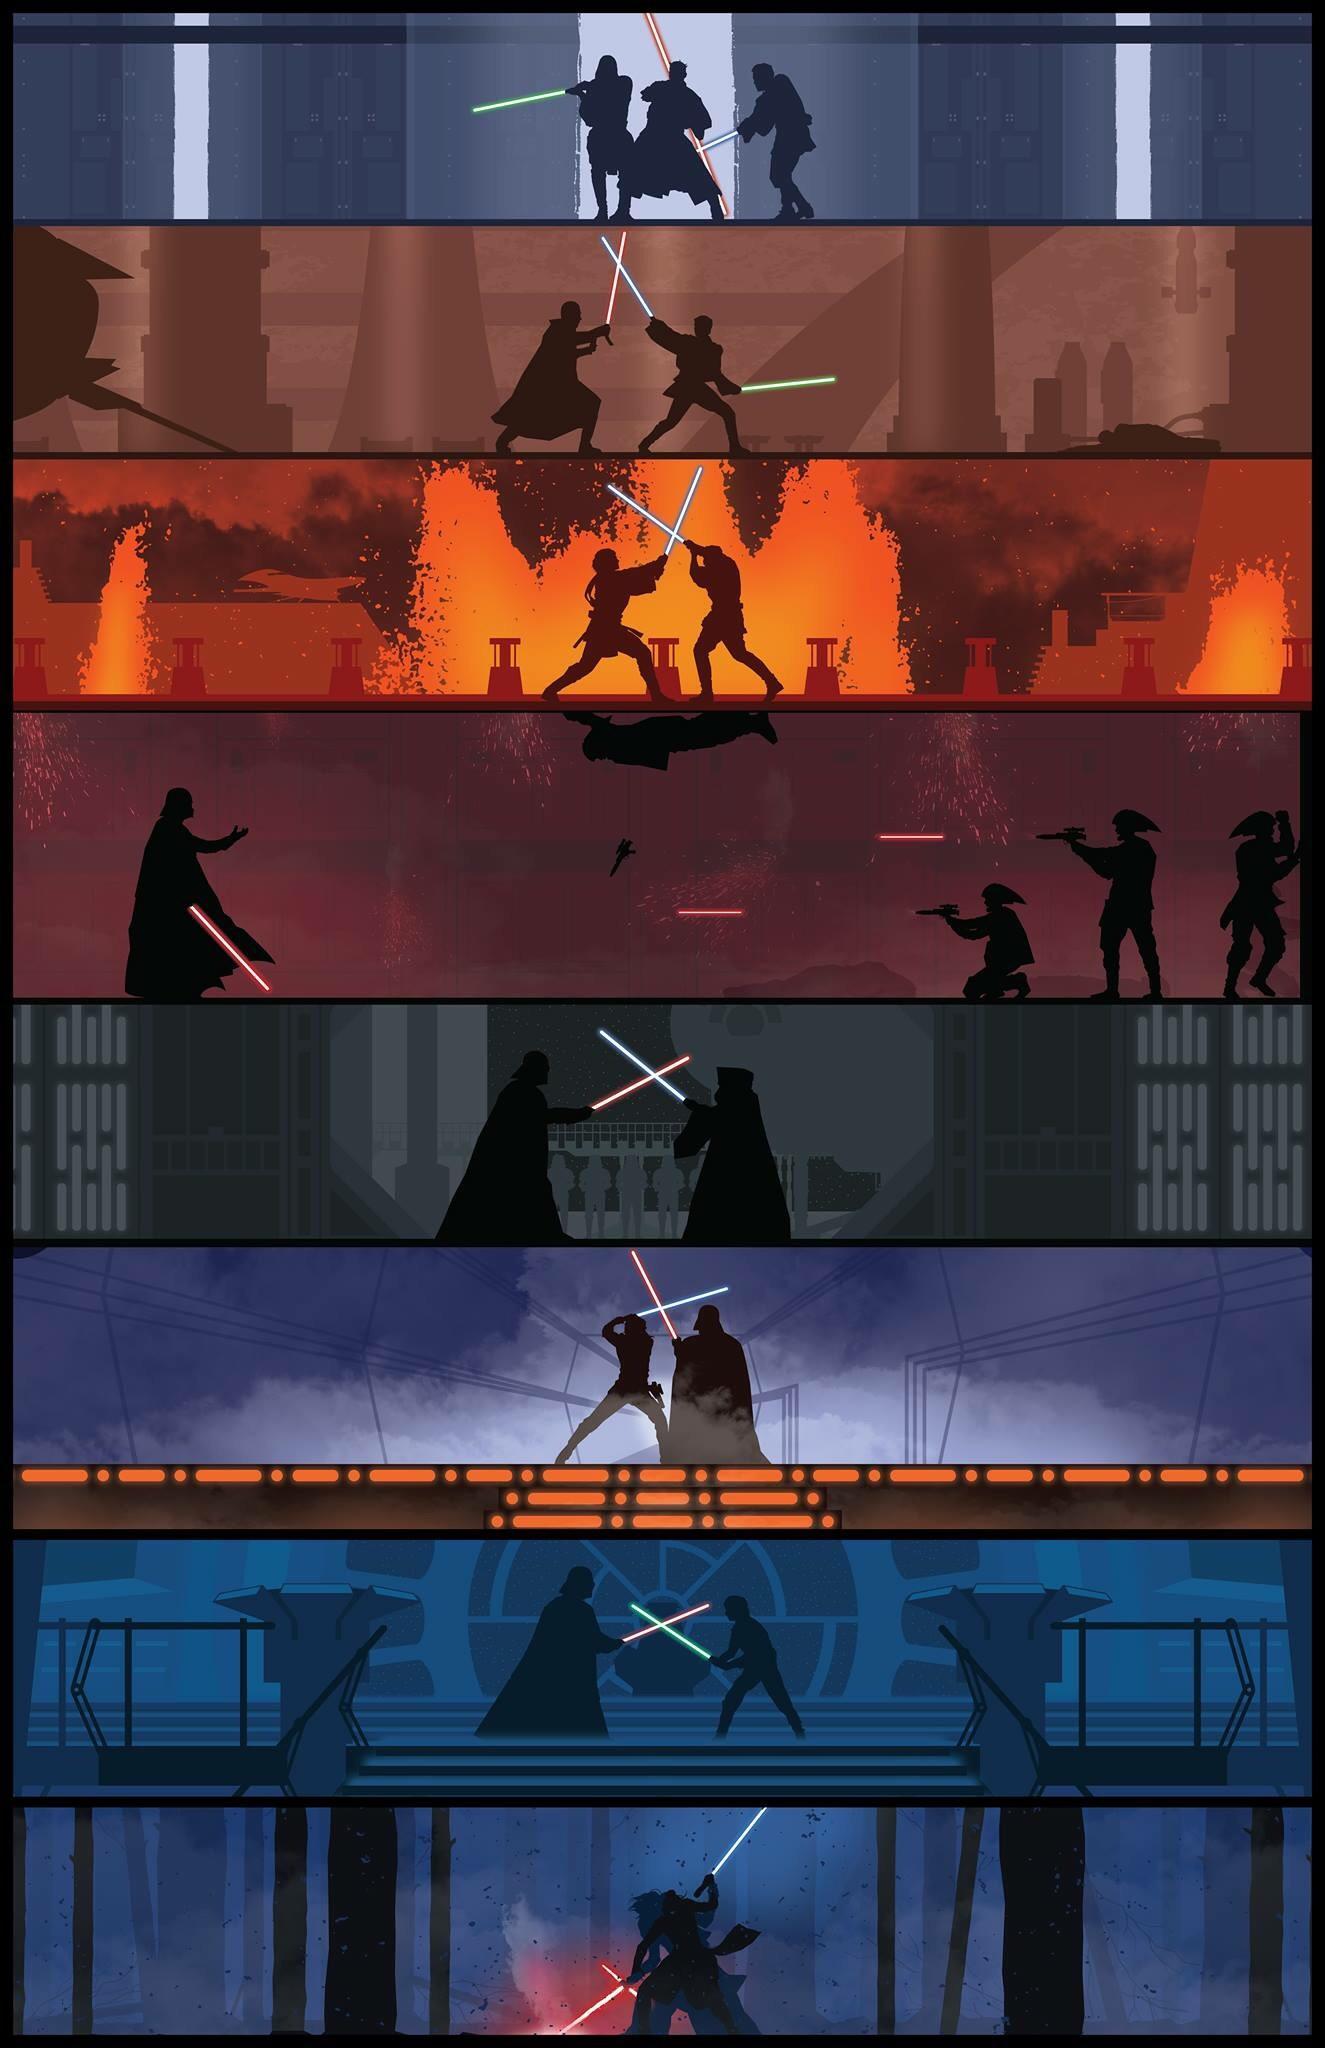 Star Wars wallpaper iphonewallpapers